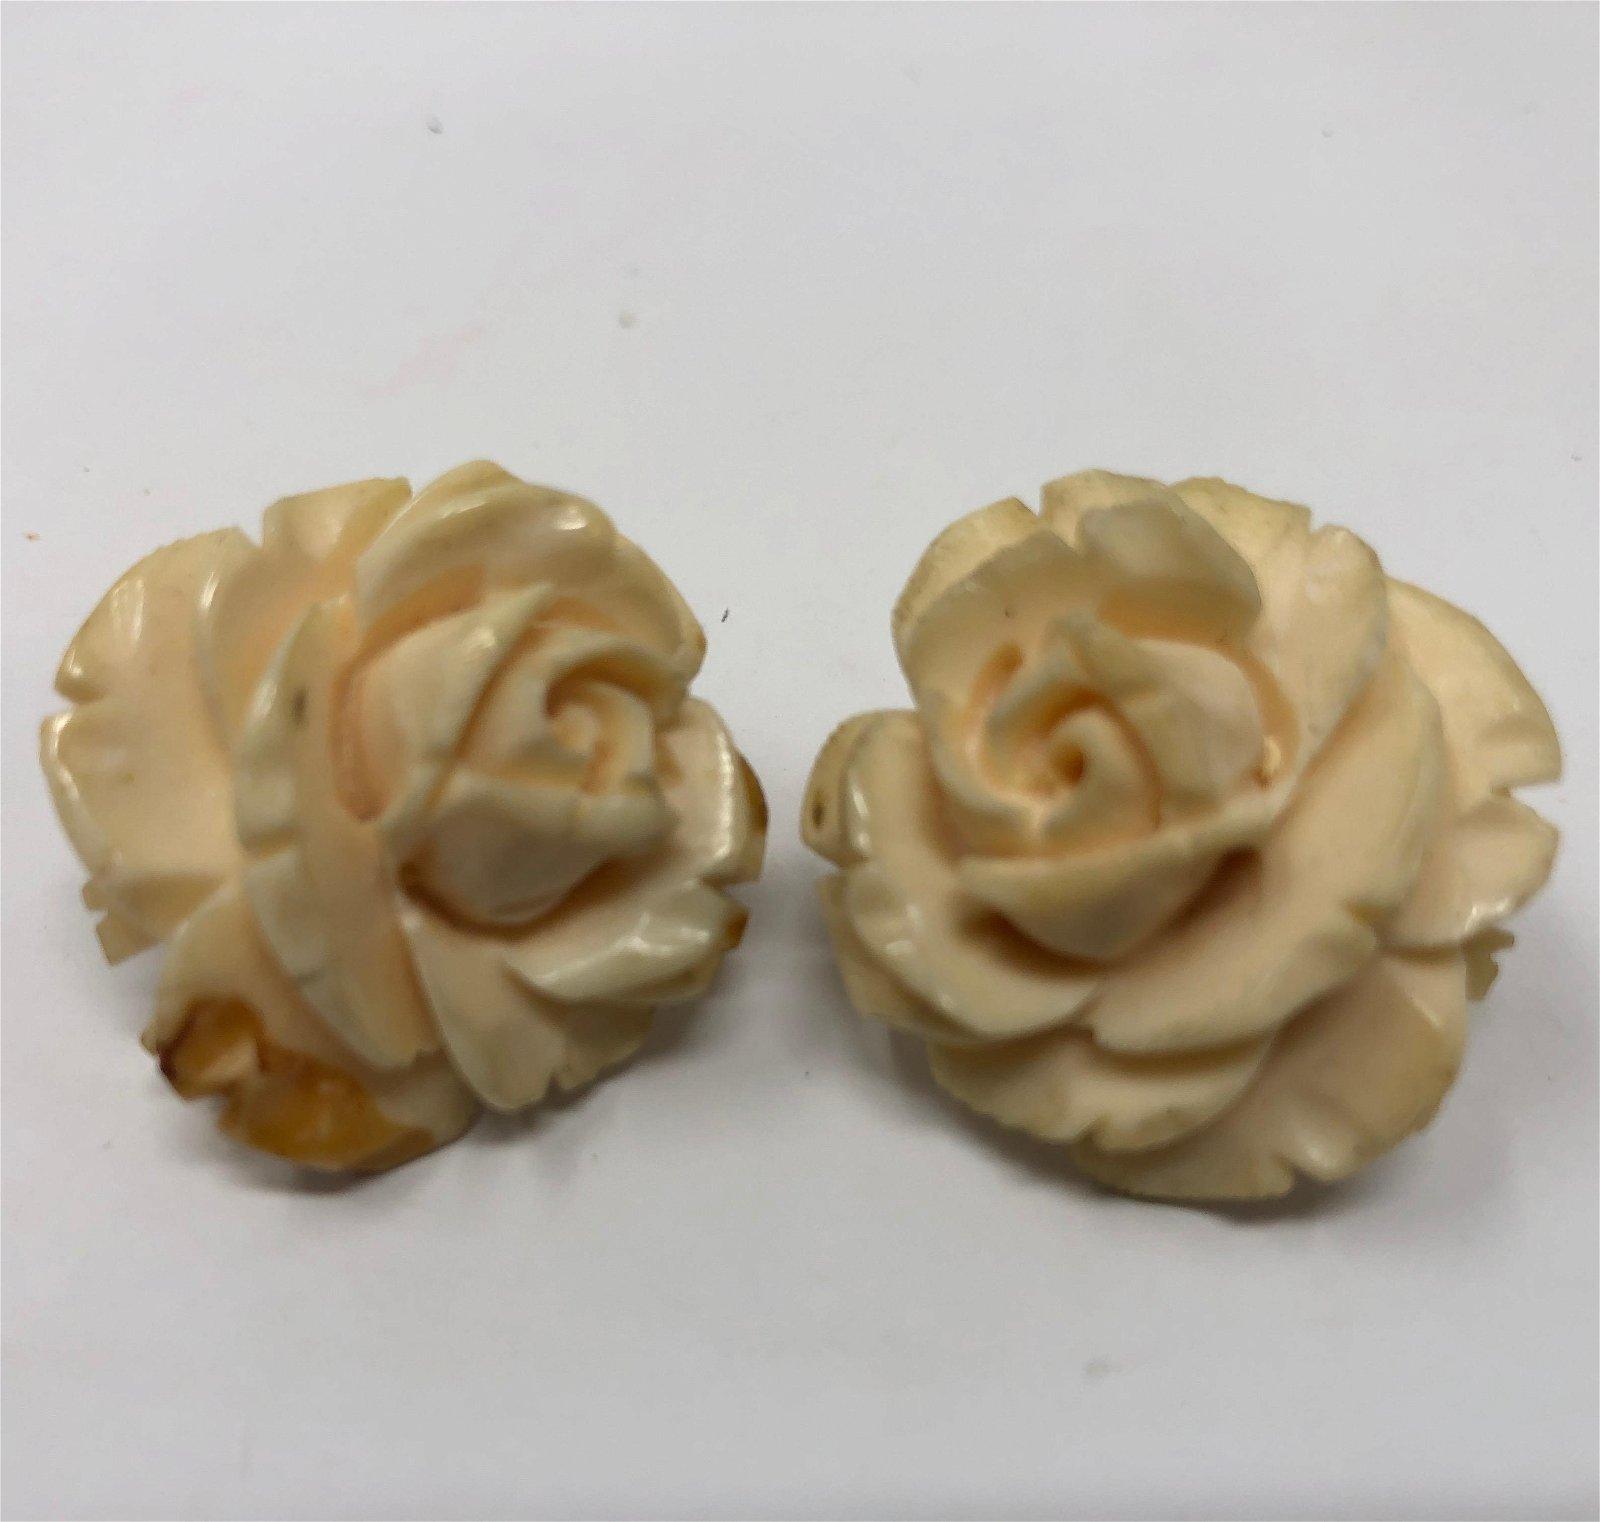 1940s Vintage Acrylic Cream Flower Earrings